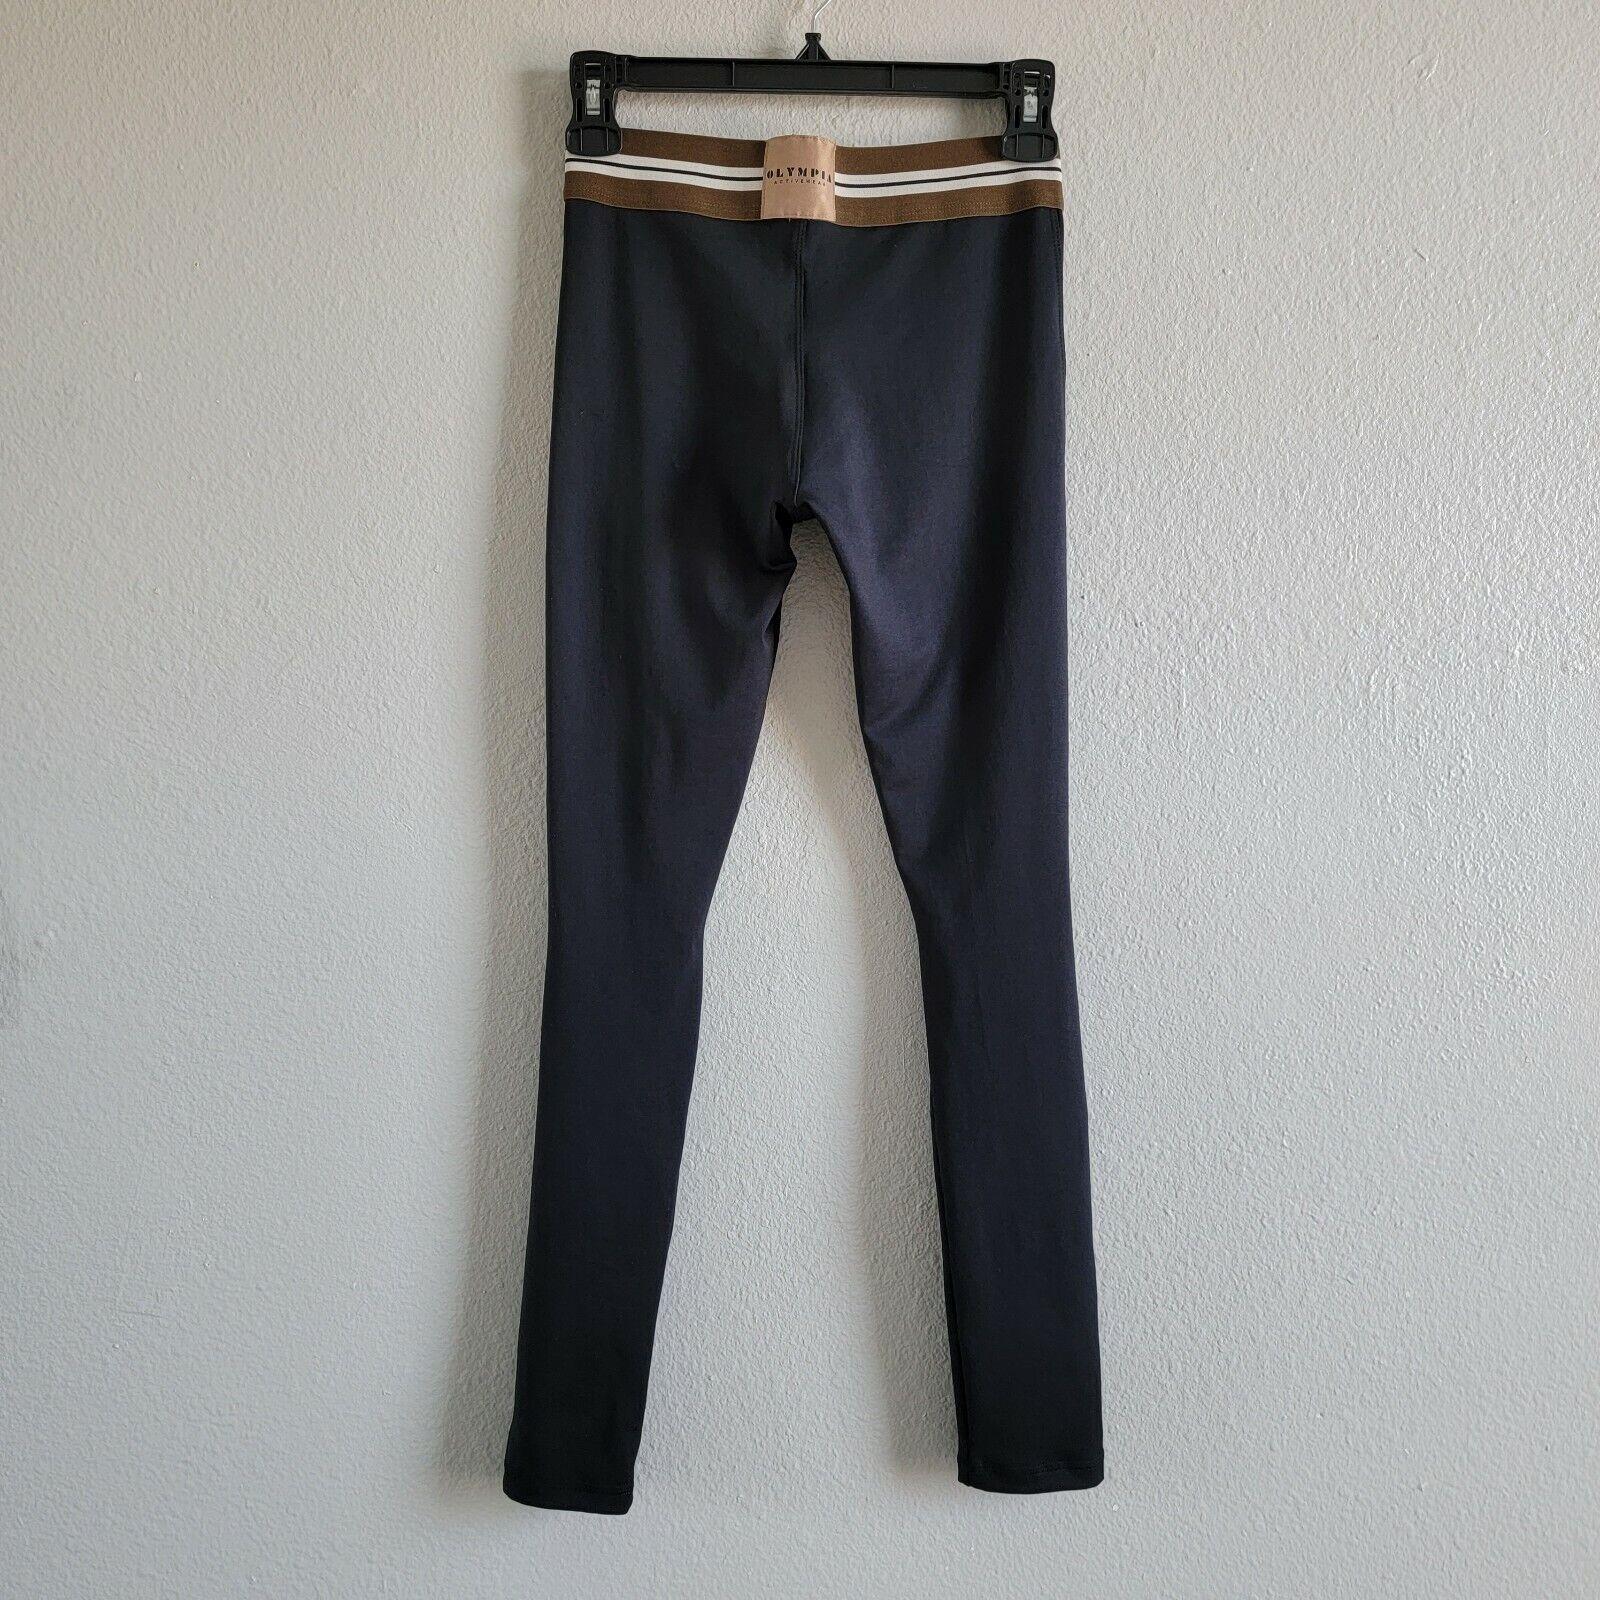 Olympia Activewear AJAX Full Lenght Black Jet Leg… - image 5